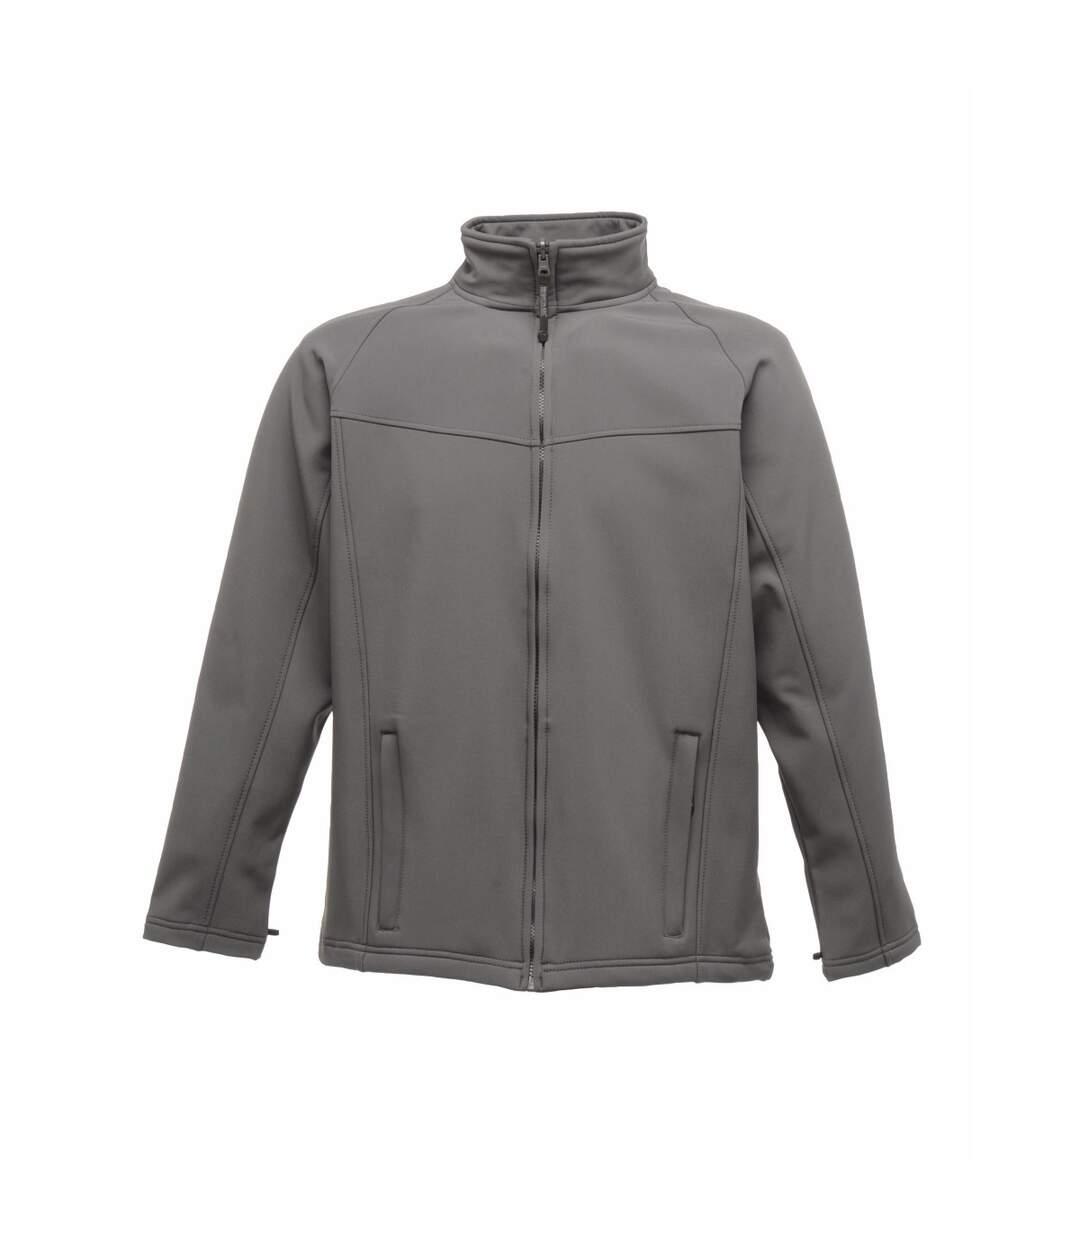 Regatta Professional Mens Uproar Softshell Wind Resistant Fleece Jacket (Seal Grey) - UTBC811